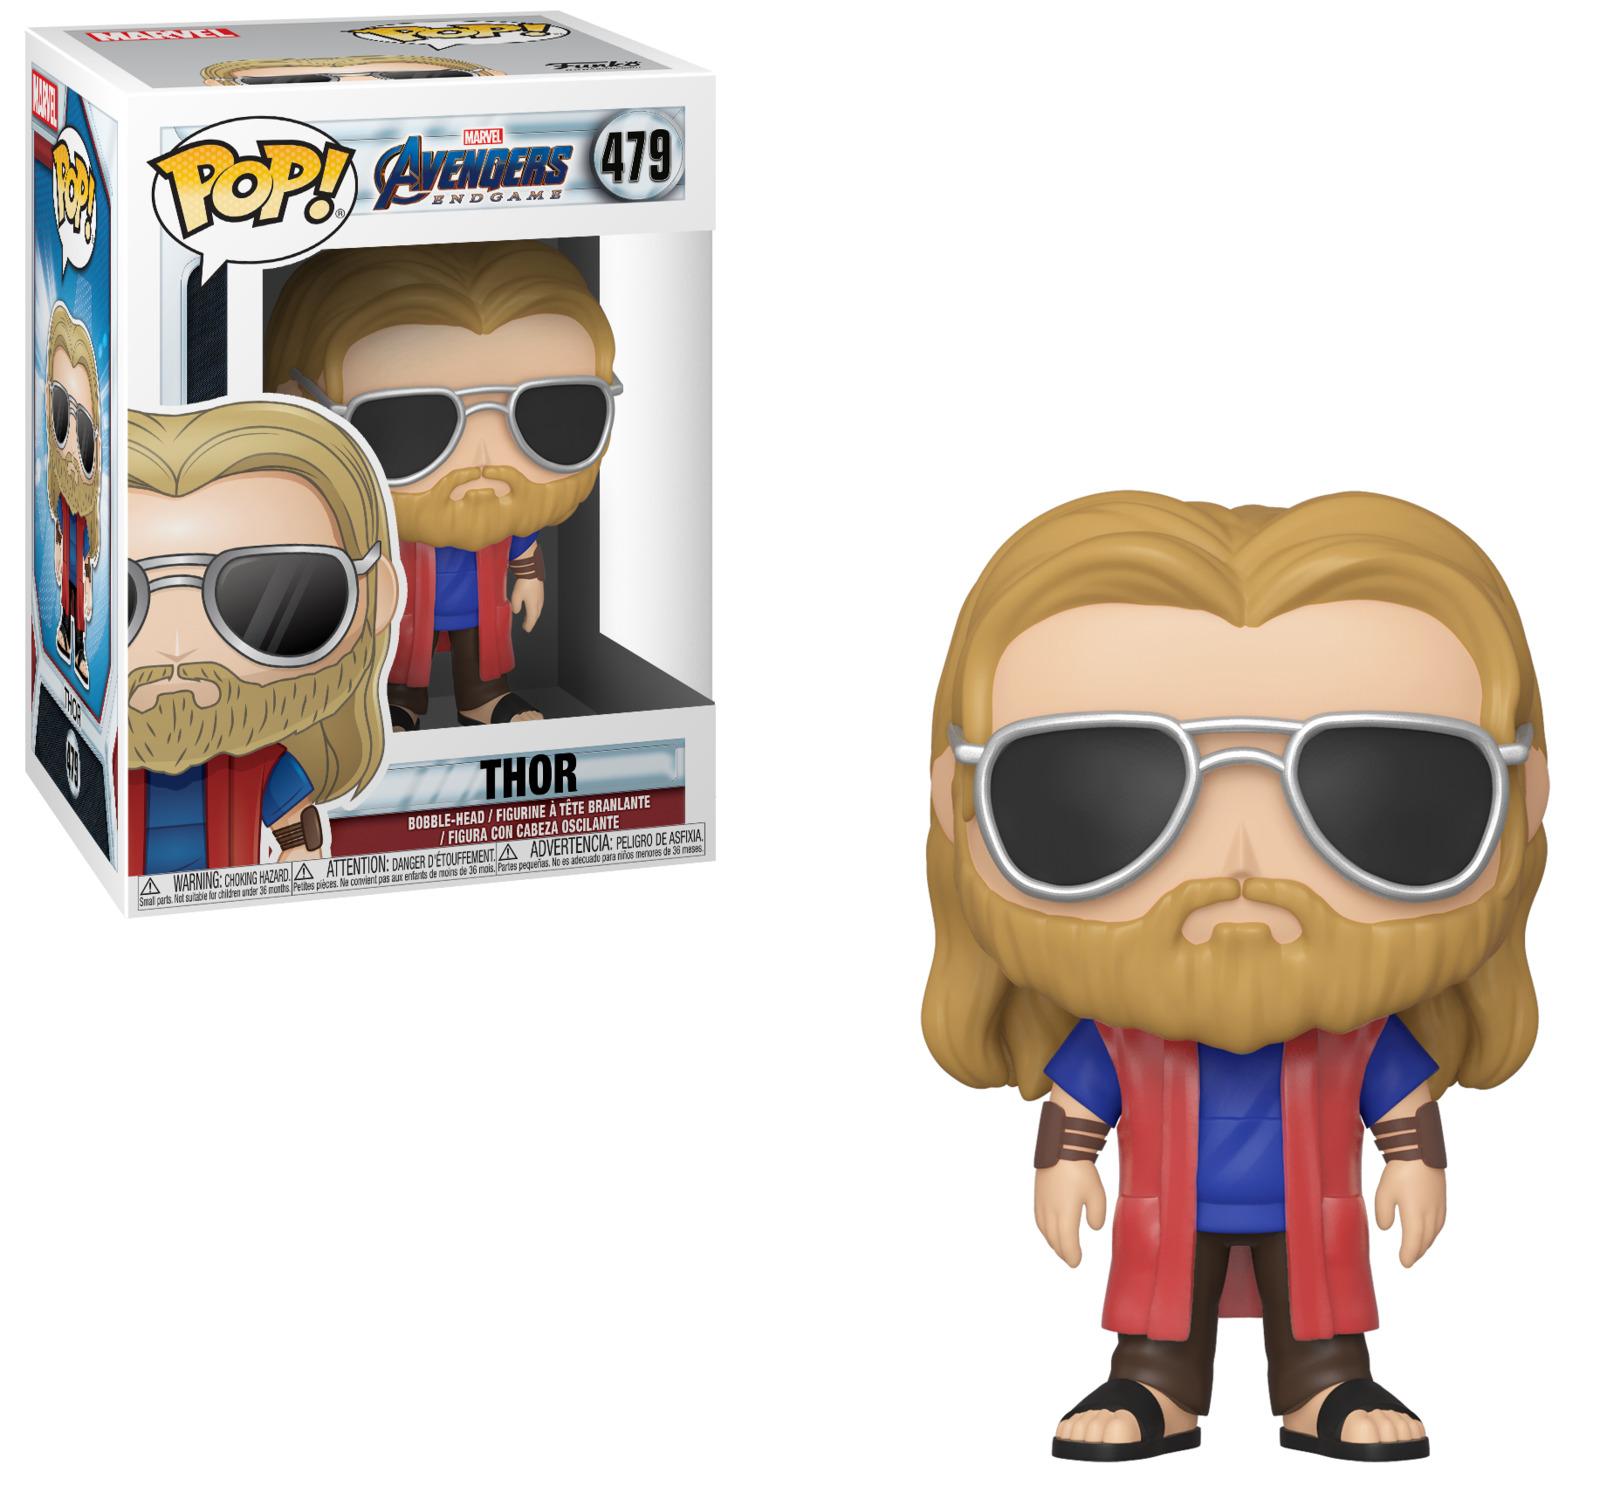 Avengers: Endgame - Thor (Casual) Pop! Vinyl Figure image